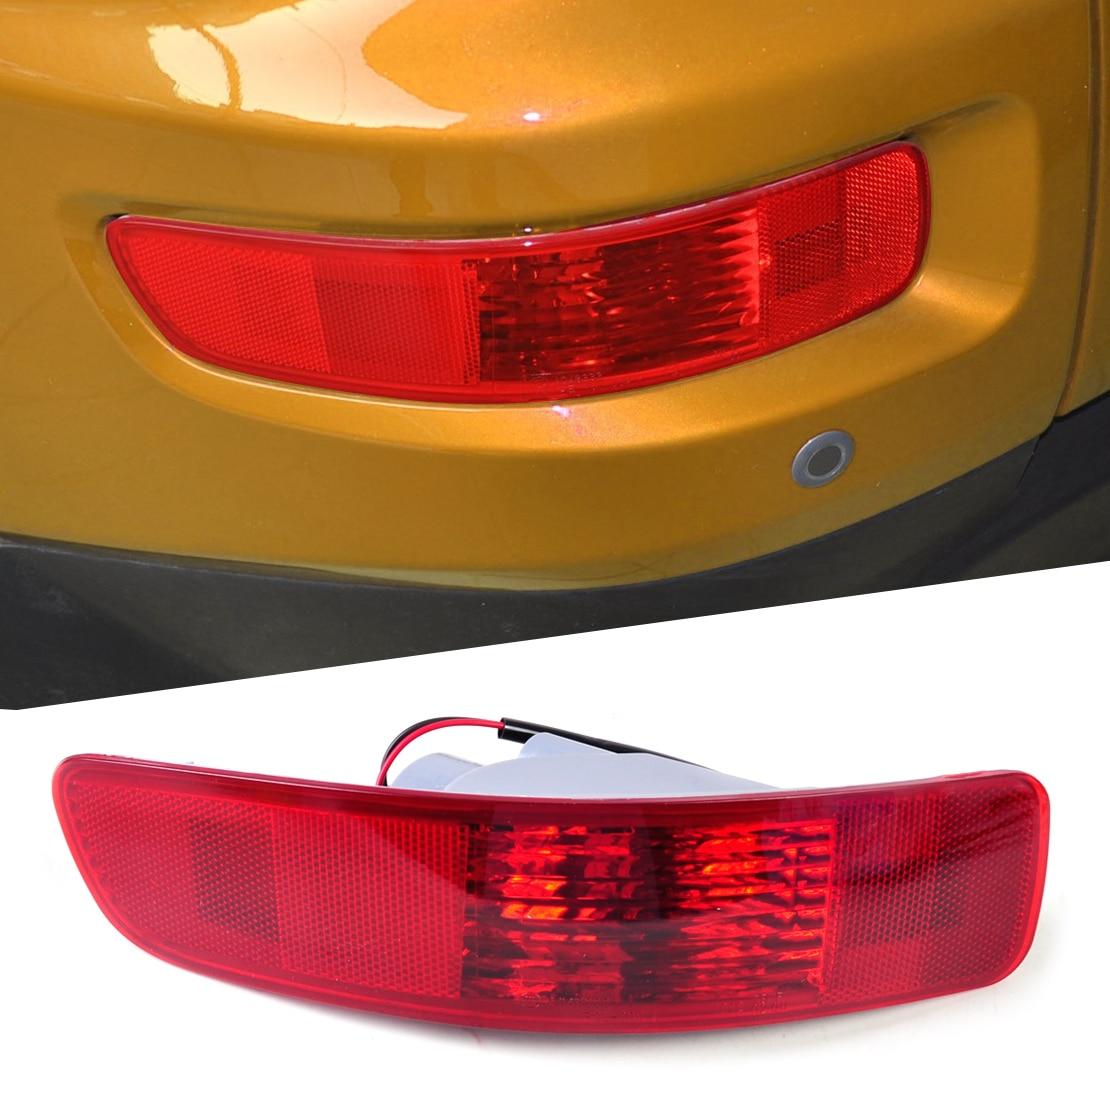 DWCX SL693-LH SL693 Rear Fog Lamp Light Left Side for Mitsubishi Outlander 2007 2008 2009 2010 2011 2012 2013 car rear trunk security shield shade cargo cover for mitsubishi outlander 2007 2008 2009 2010 2011 2012 2013 2015 black beige